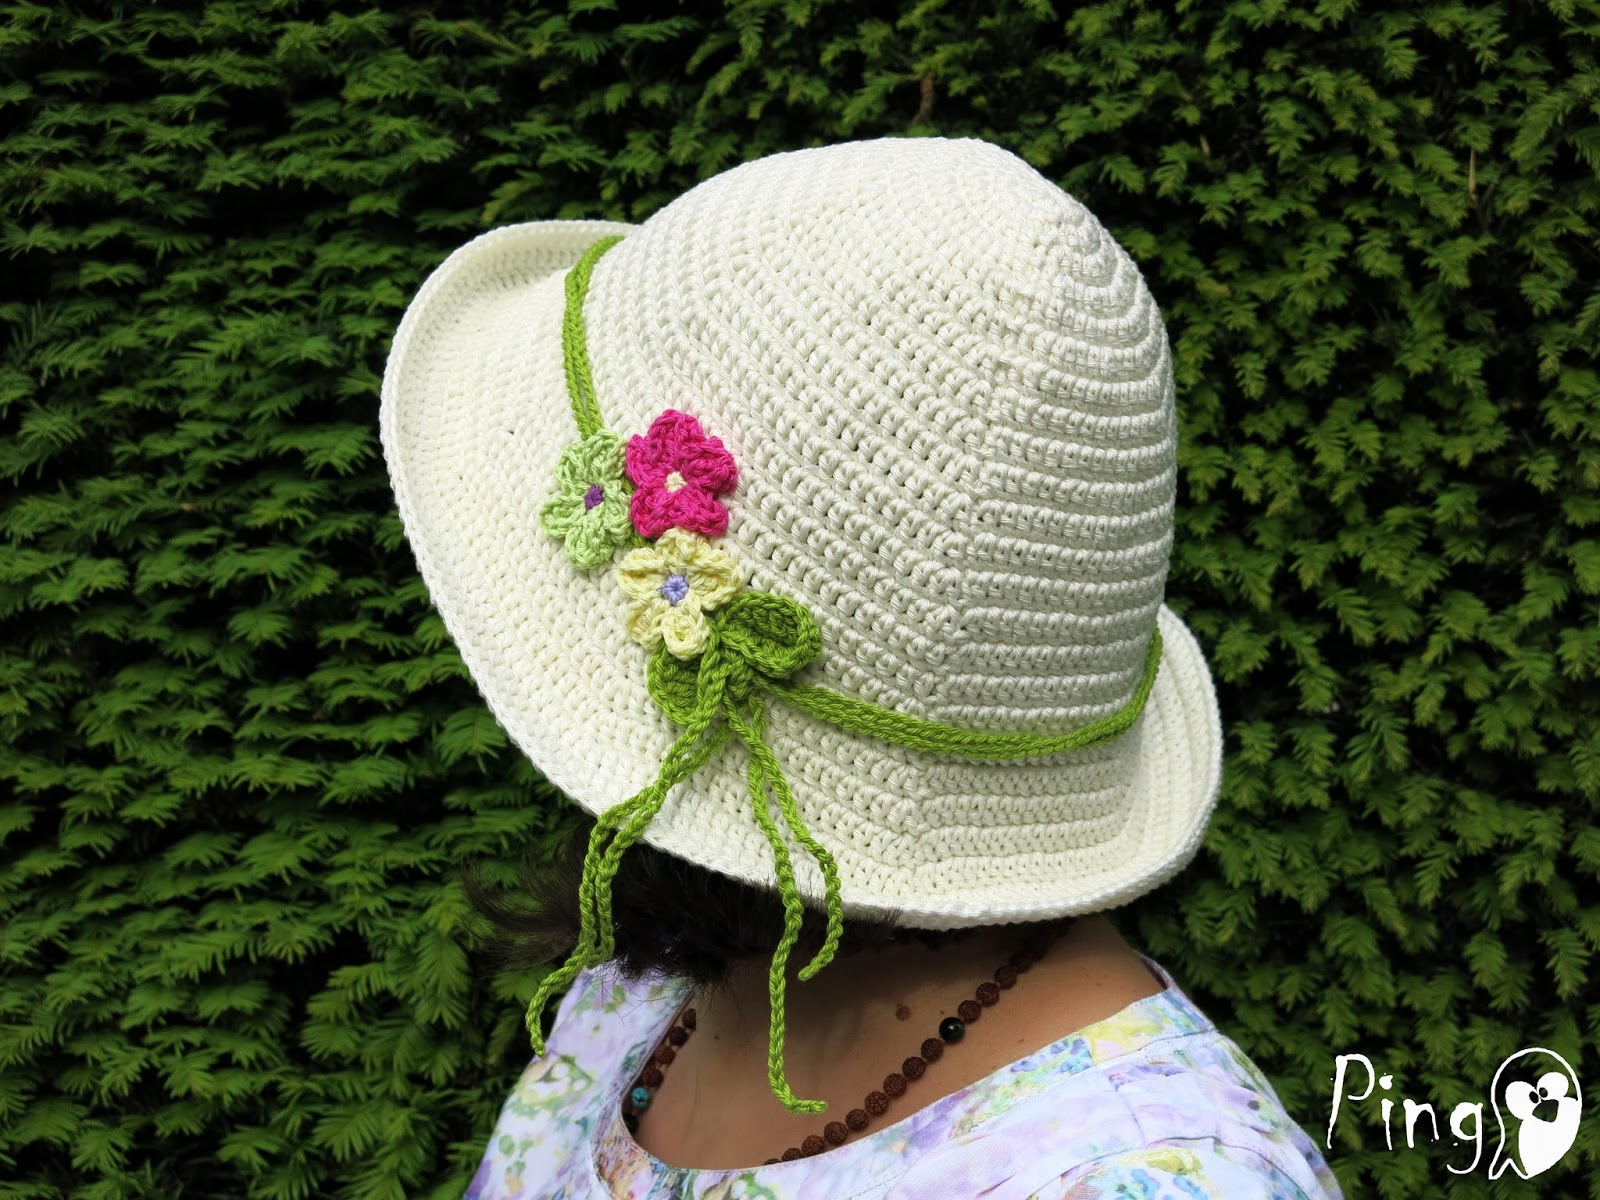 Pingo - The Pink Penguin  Crochet Hat Summer Breeze d4ce45c175e